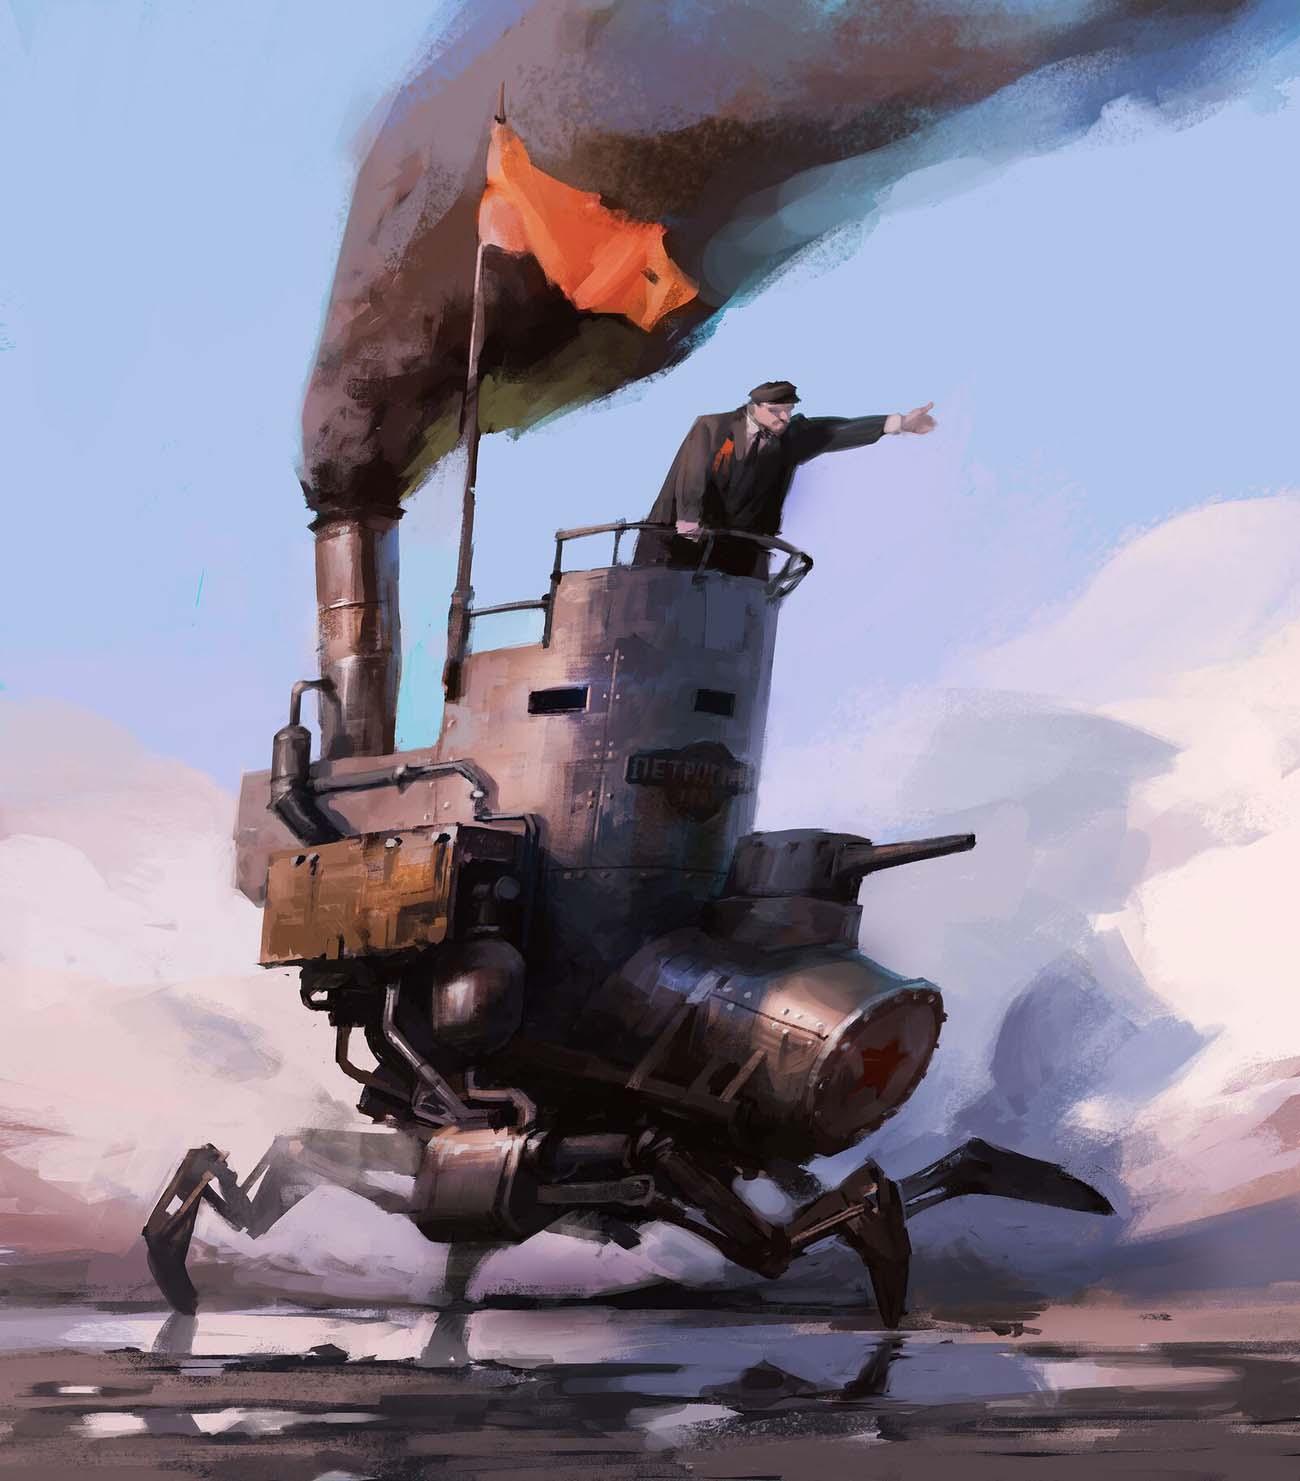 Vladimir Malakhovskiy | Paintable.cc Digital Painting Inspiration - Learn the Art of Digital Painting! #digitalpainting #digitalart